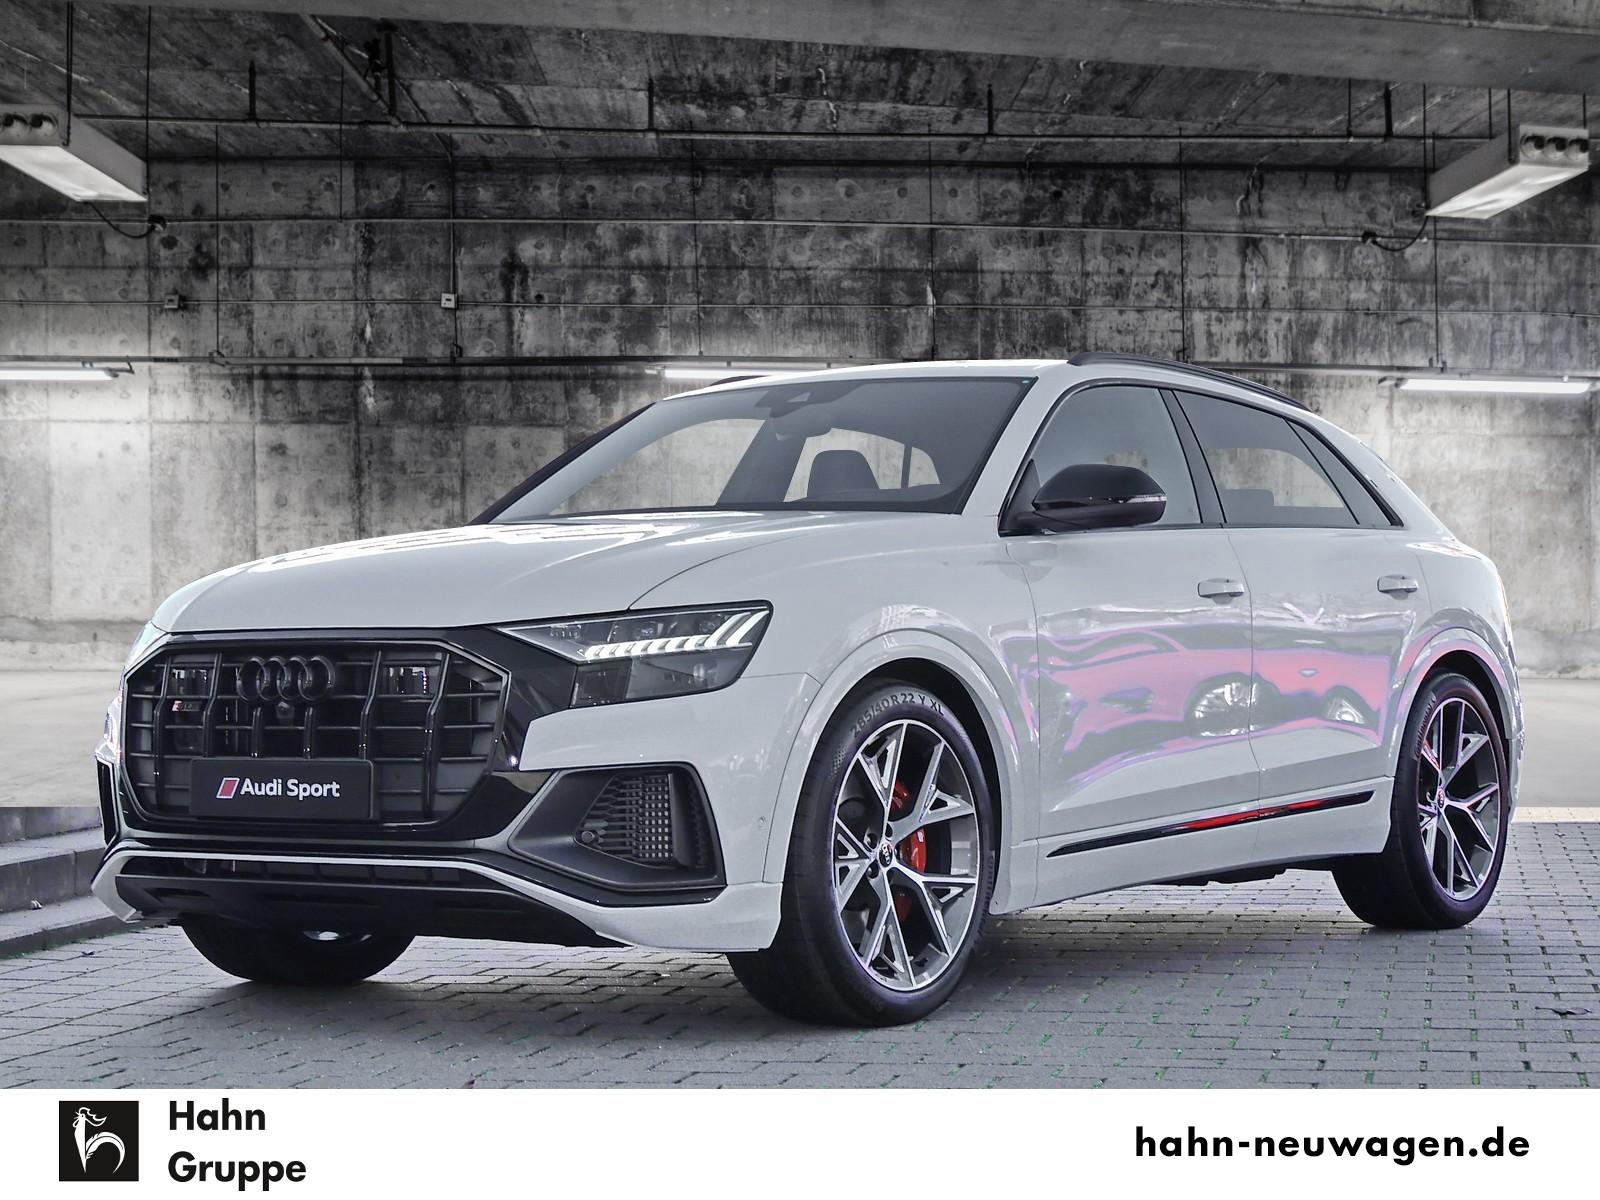 Audi SQ8 TFSI 373(507) kW(PS) tiptronic Assistenzpaket Plus, Matrix, Standheizung, Panoramaglasdach, Jahr 2021, Benzin